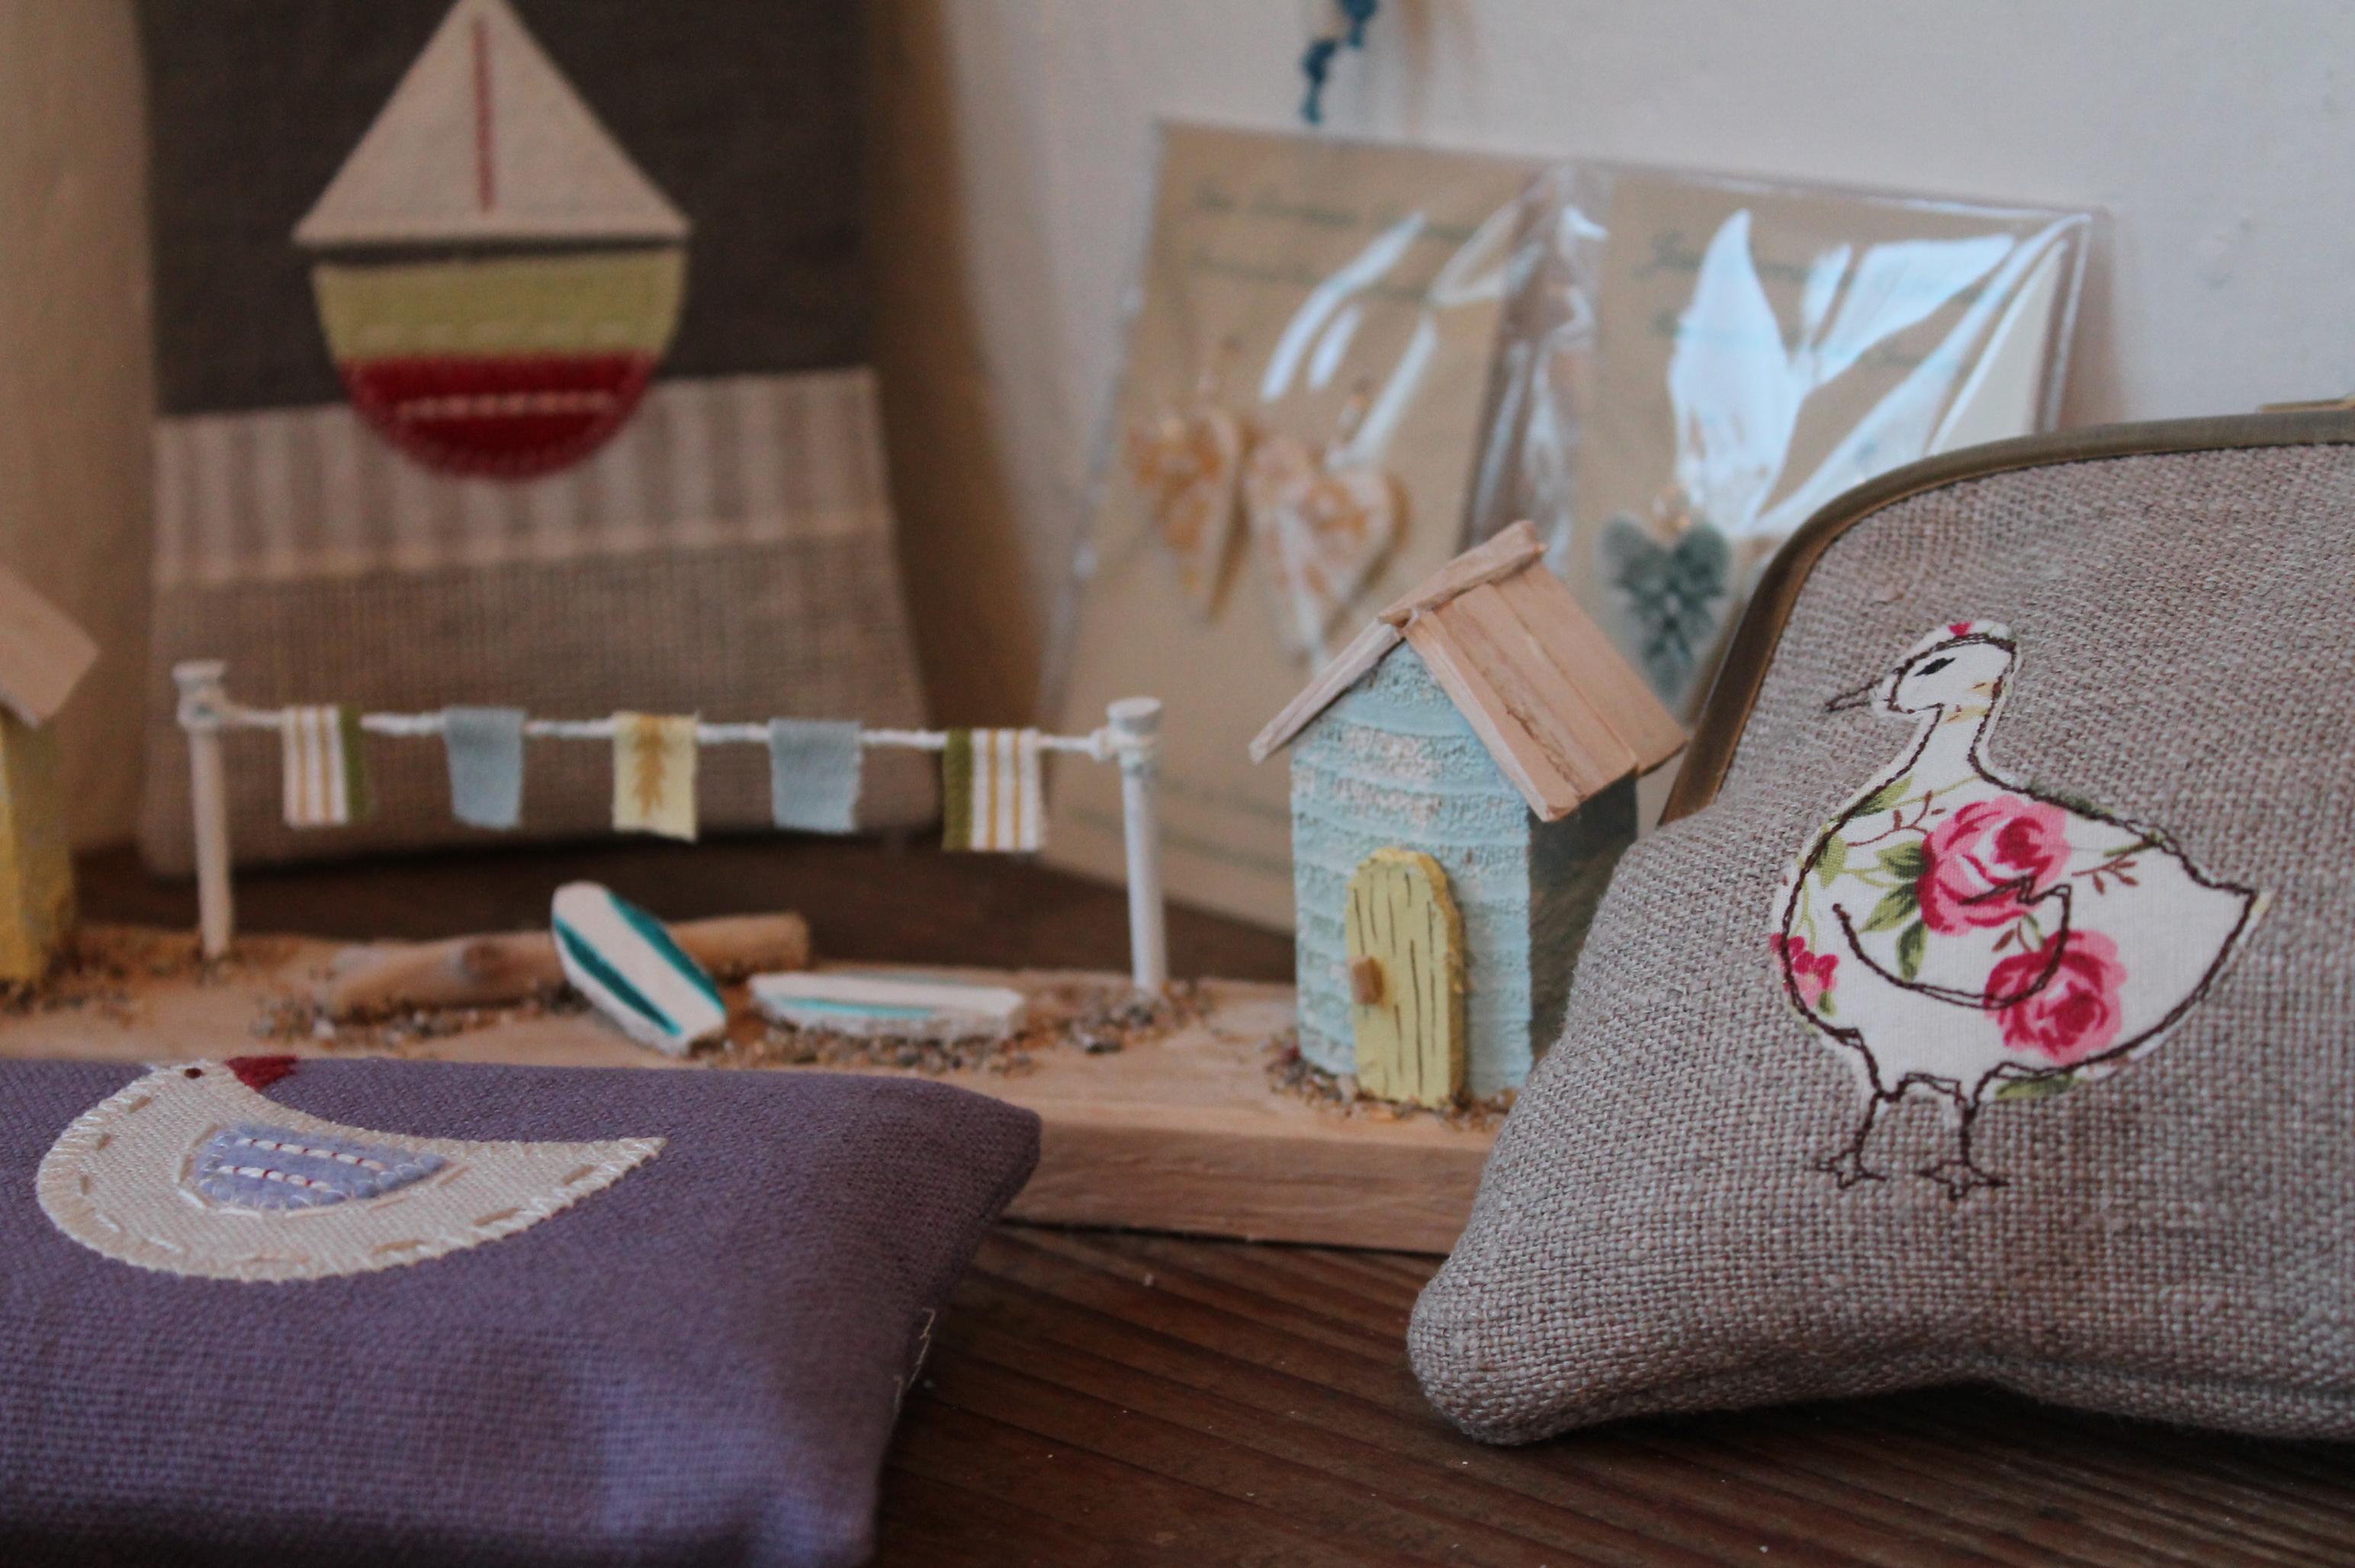 shop/cafe - freathy farmhouse